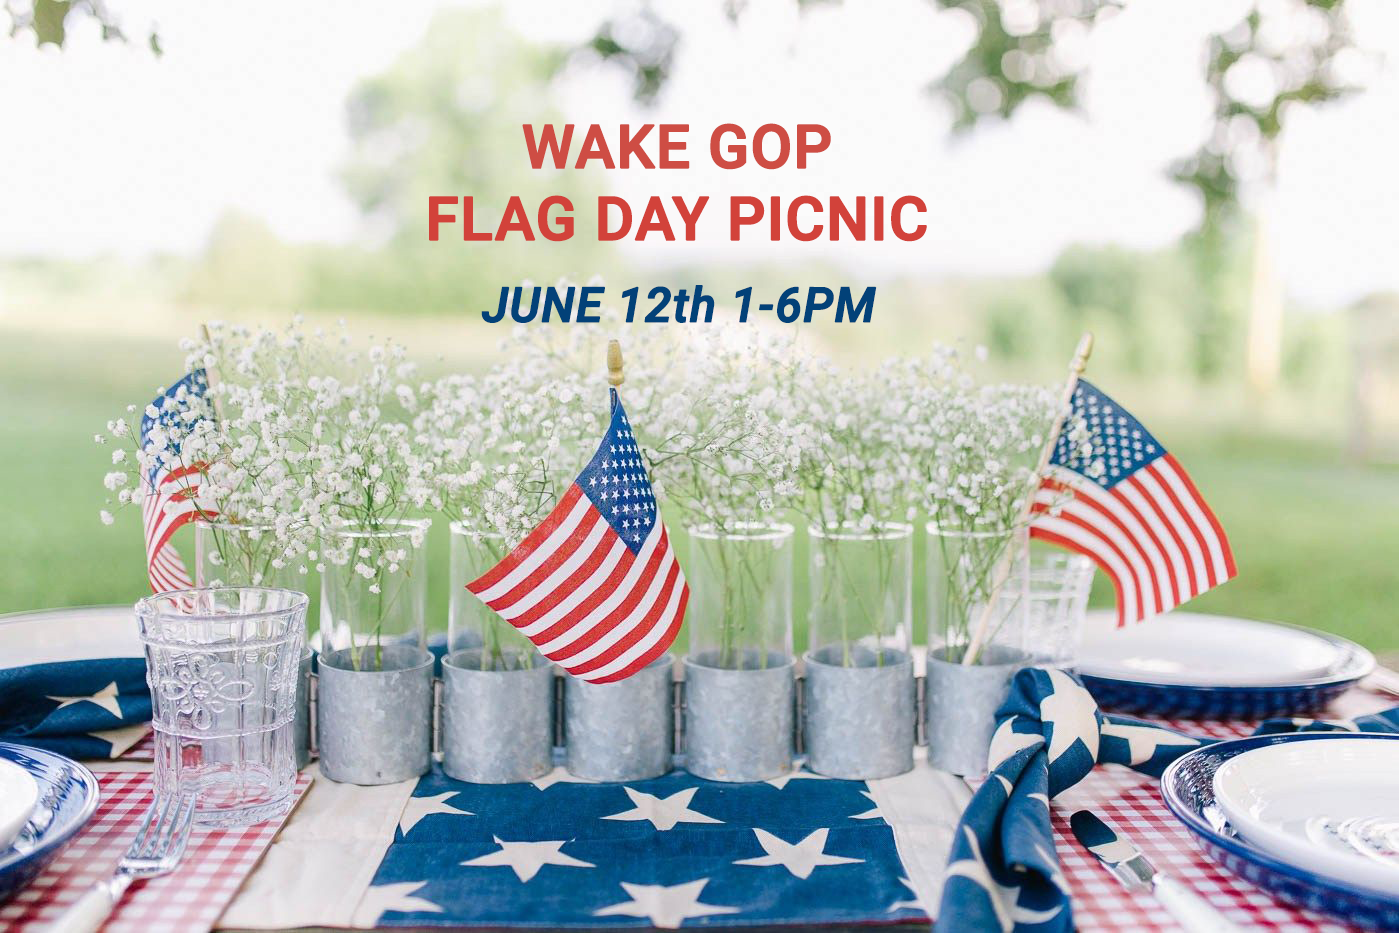 Flag Day Picnic